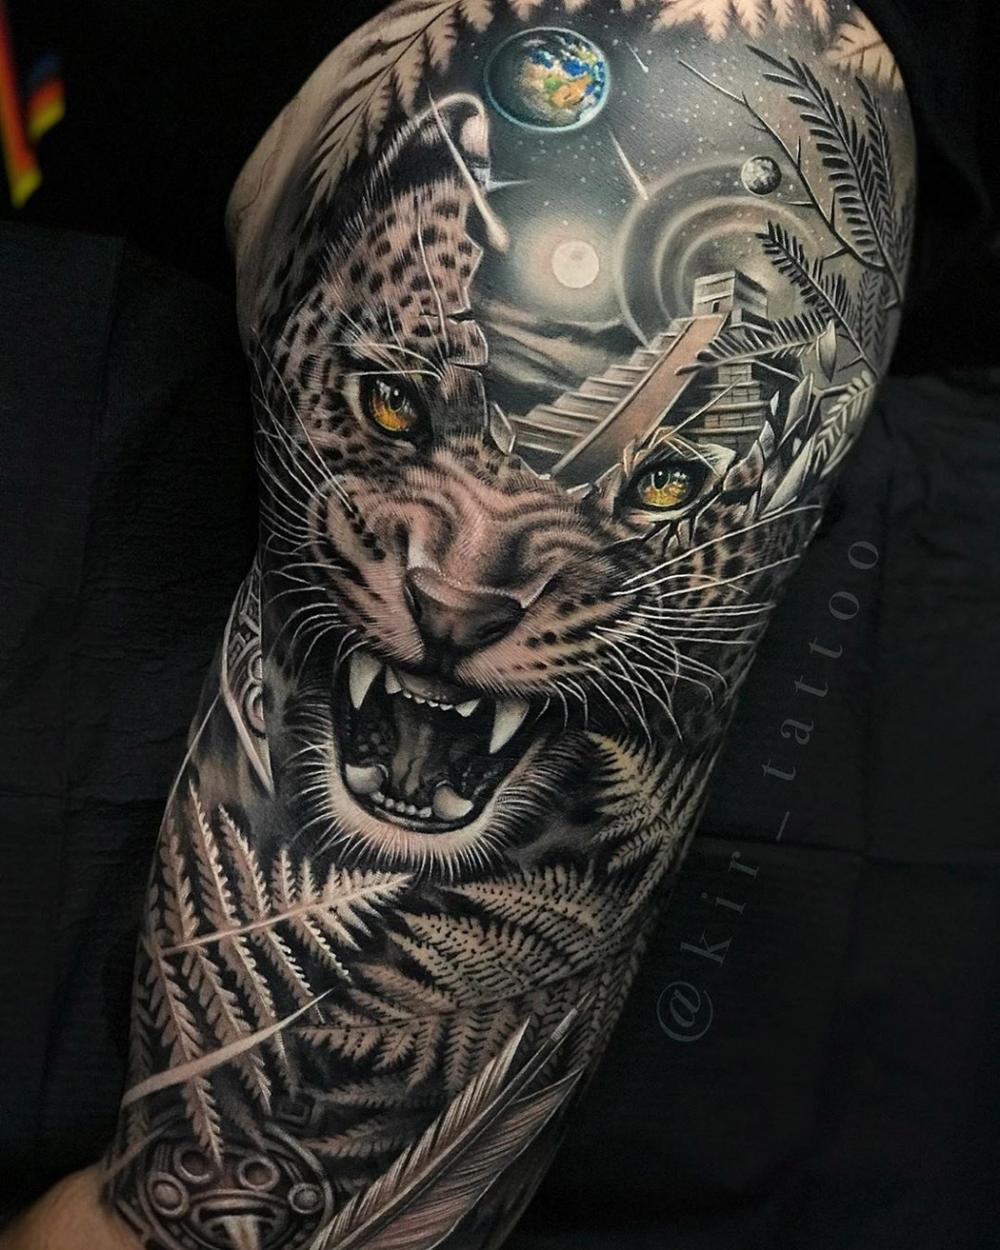 Amazon Jungle Sleeve Jungle Tattoo Jaguar Tattoo Best Sleeve Tattoos